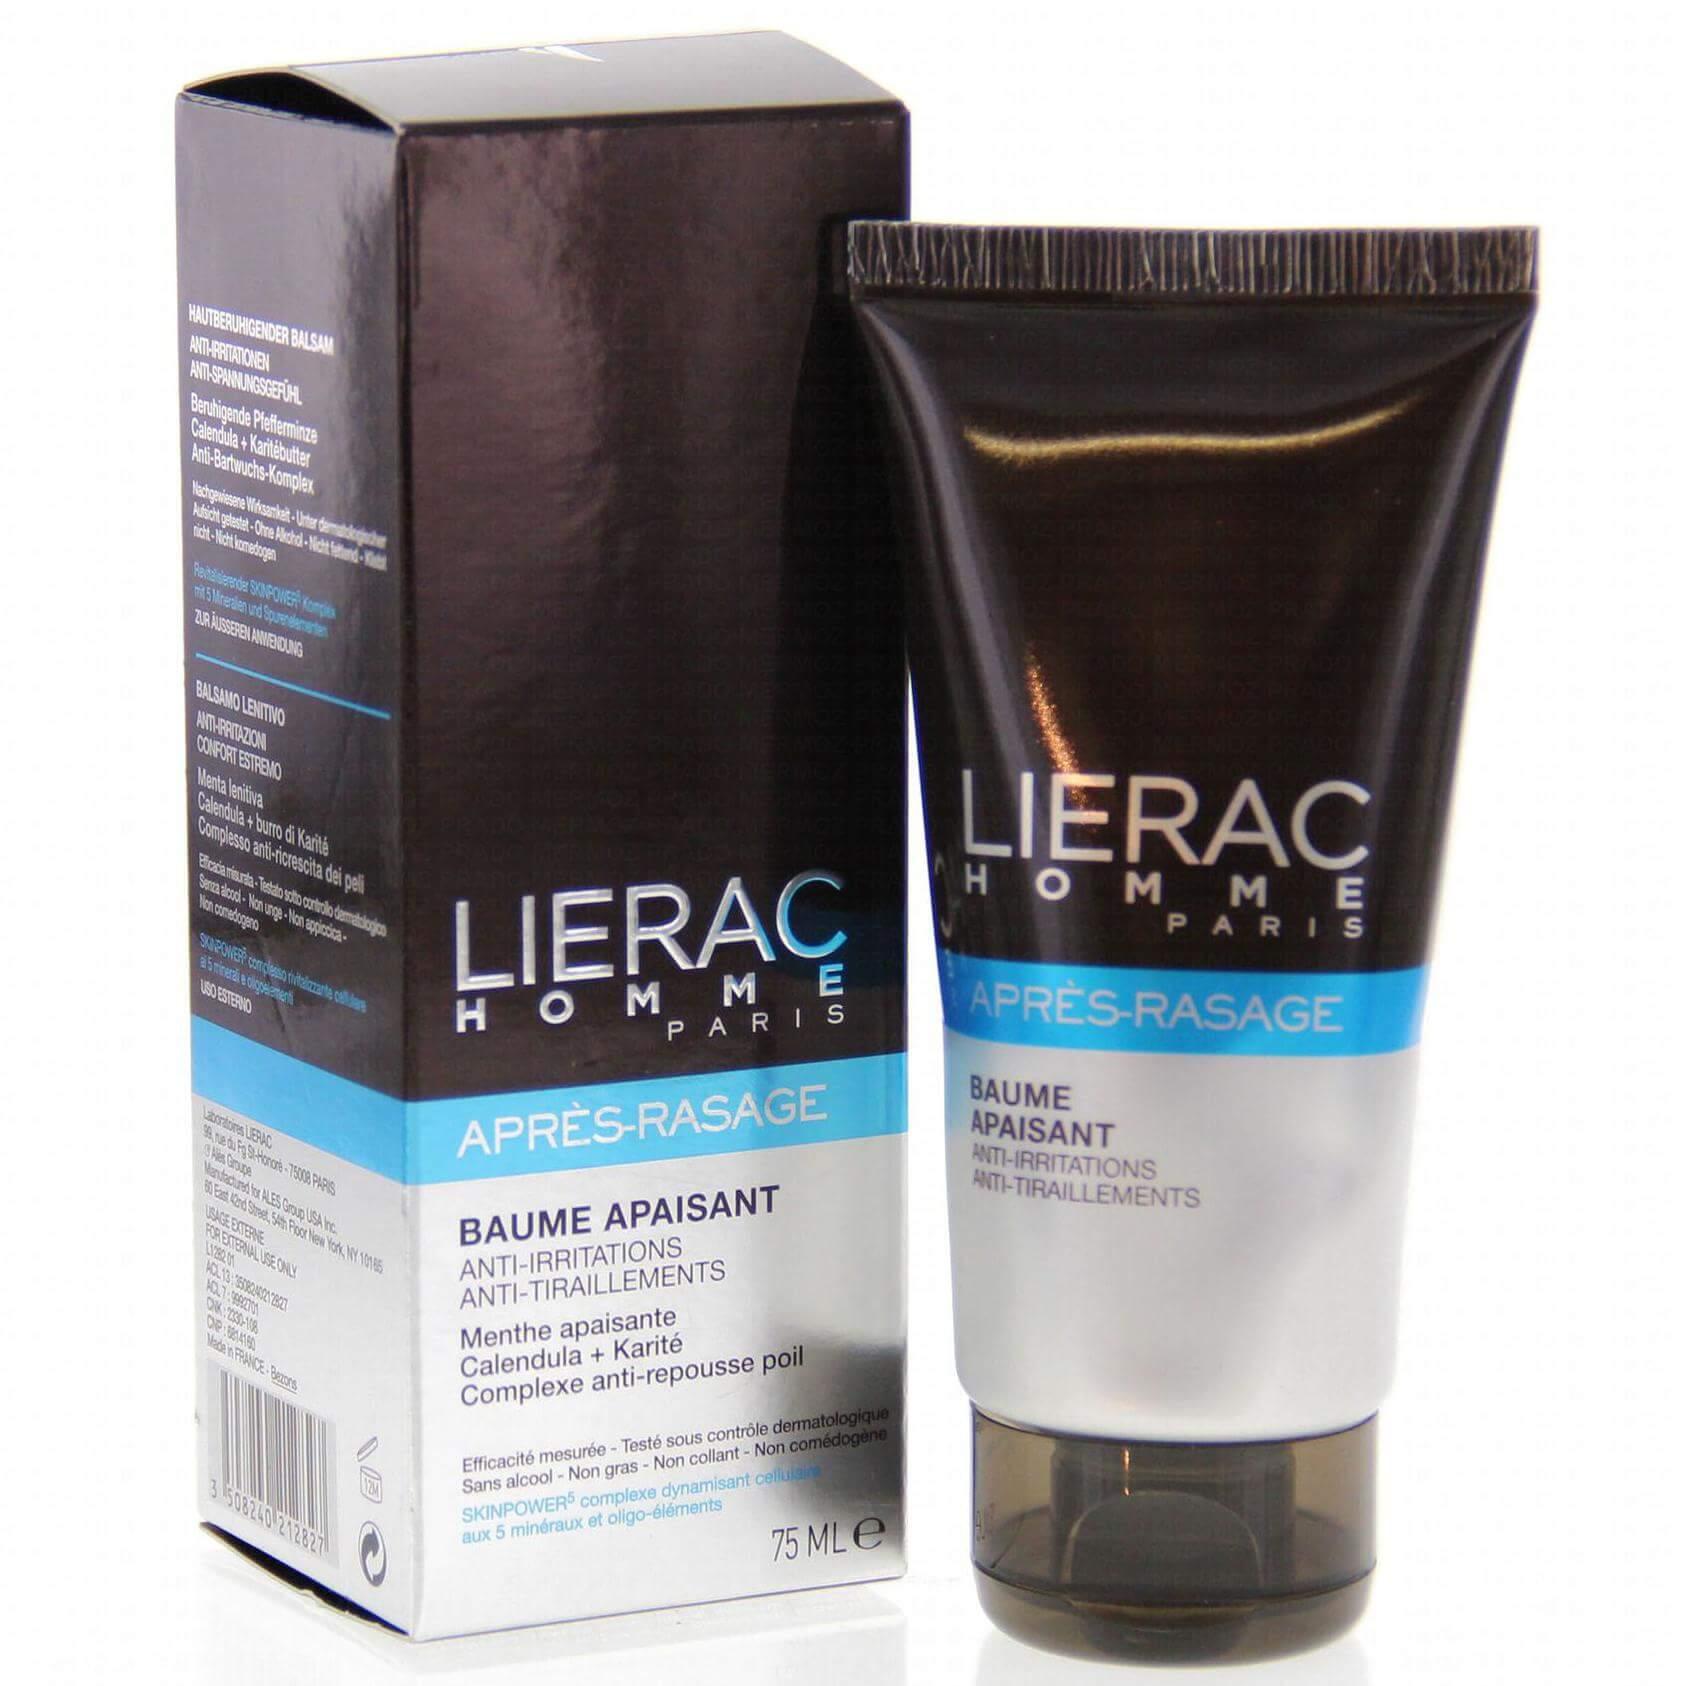 Lierac Homme Baume Apaisant Ενυδατικό Aftershave Κατά Των Ερεθισμών 75ml